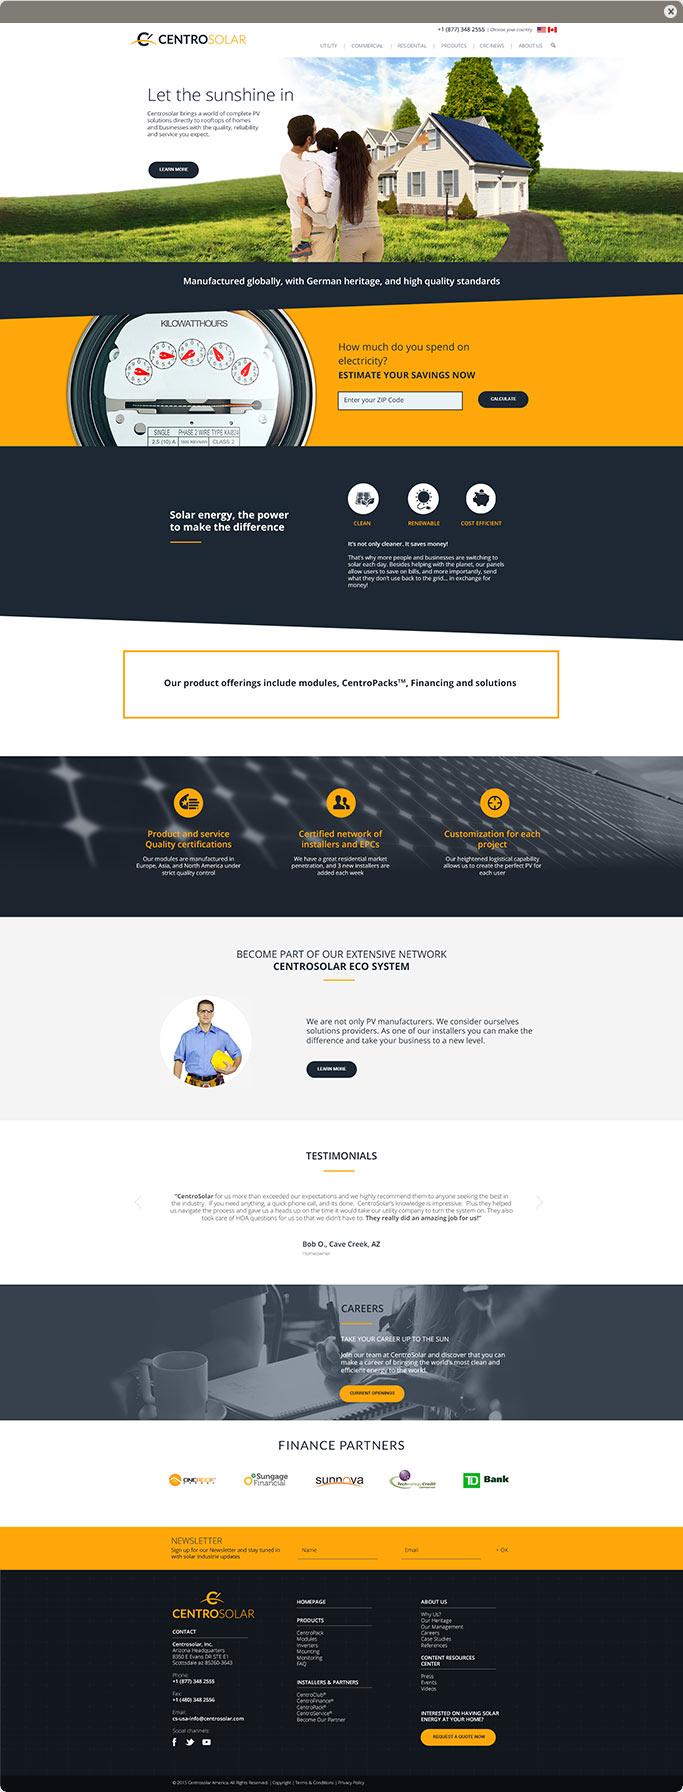 CentroSolar-web01